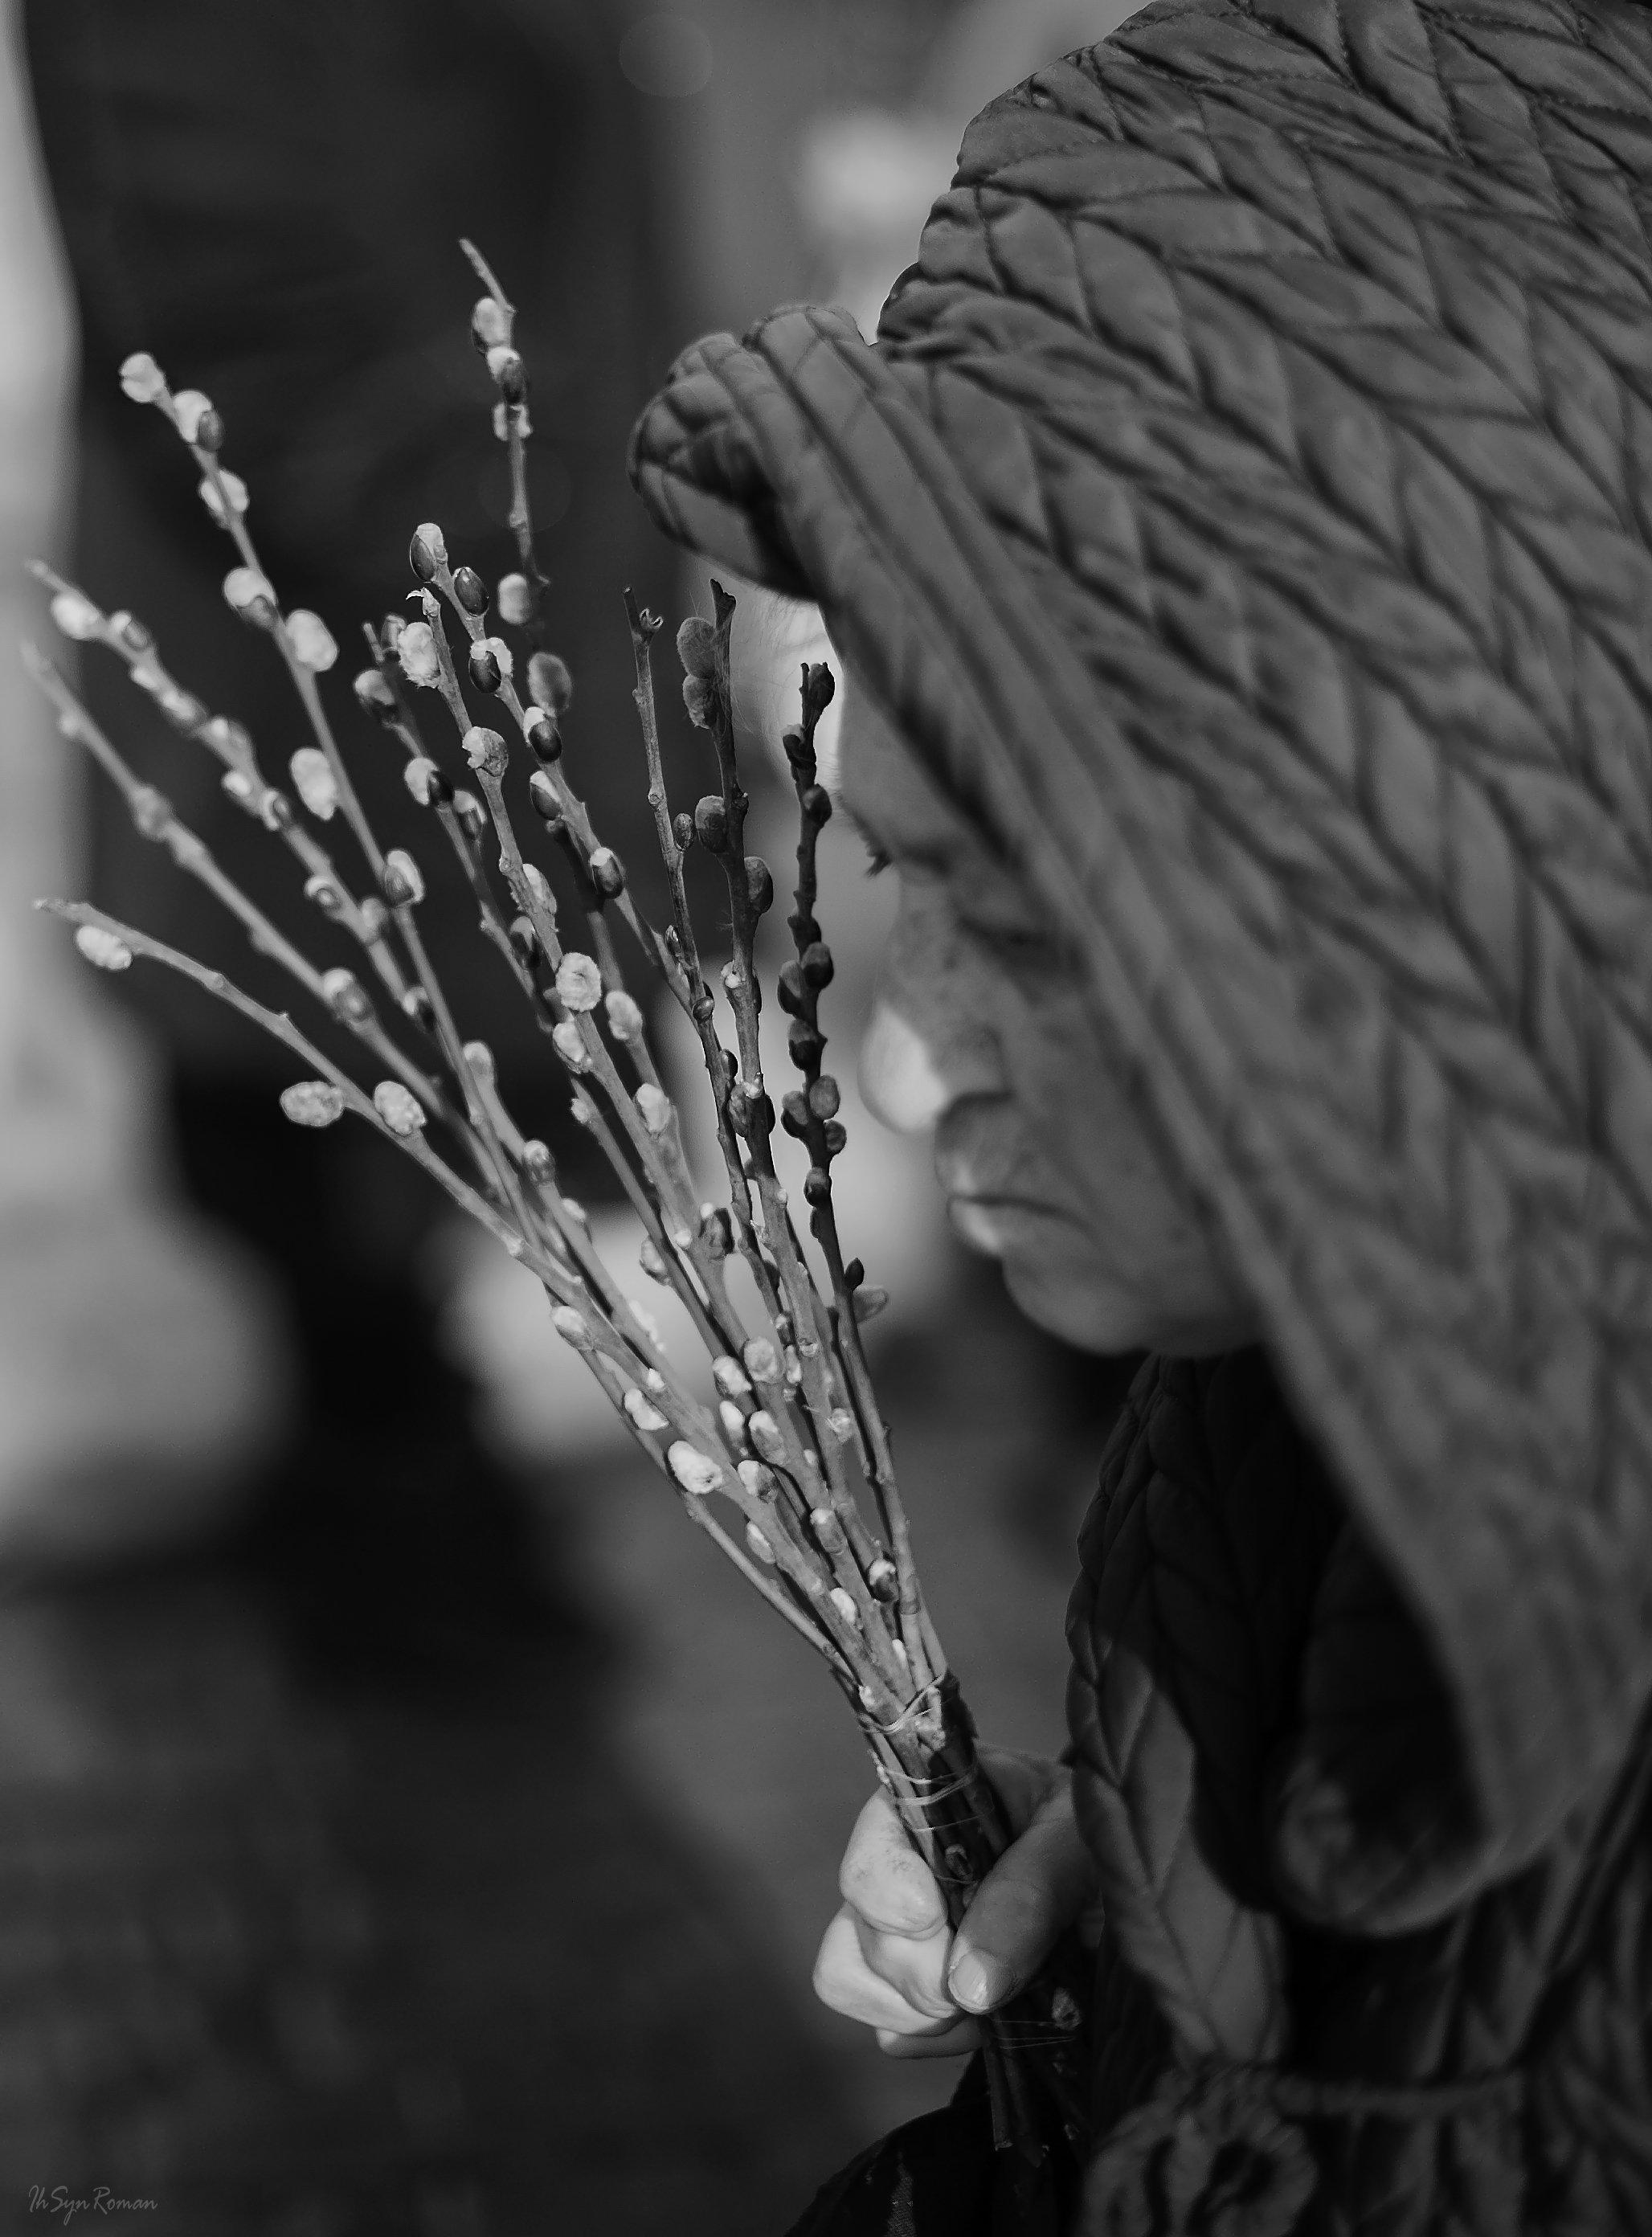 женщина,жанр,улица,букет,верба, Roma  Chitinskiy